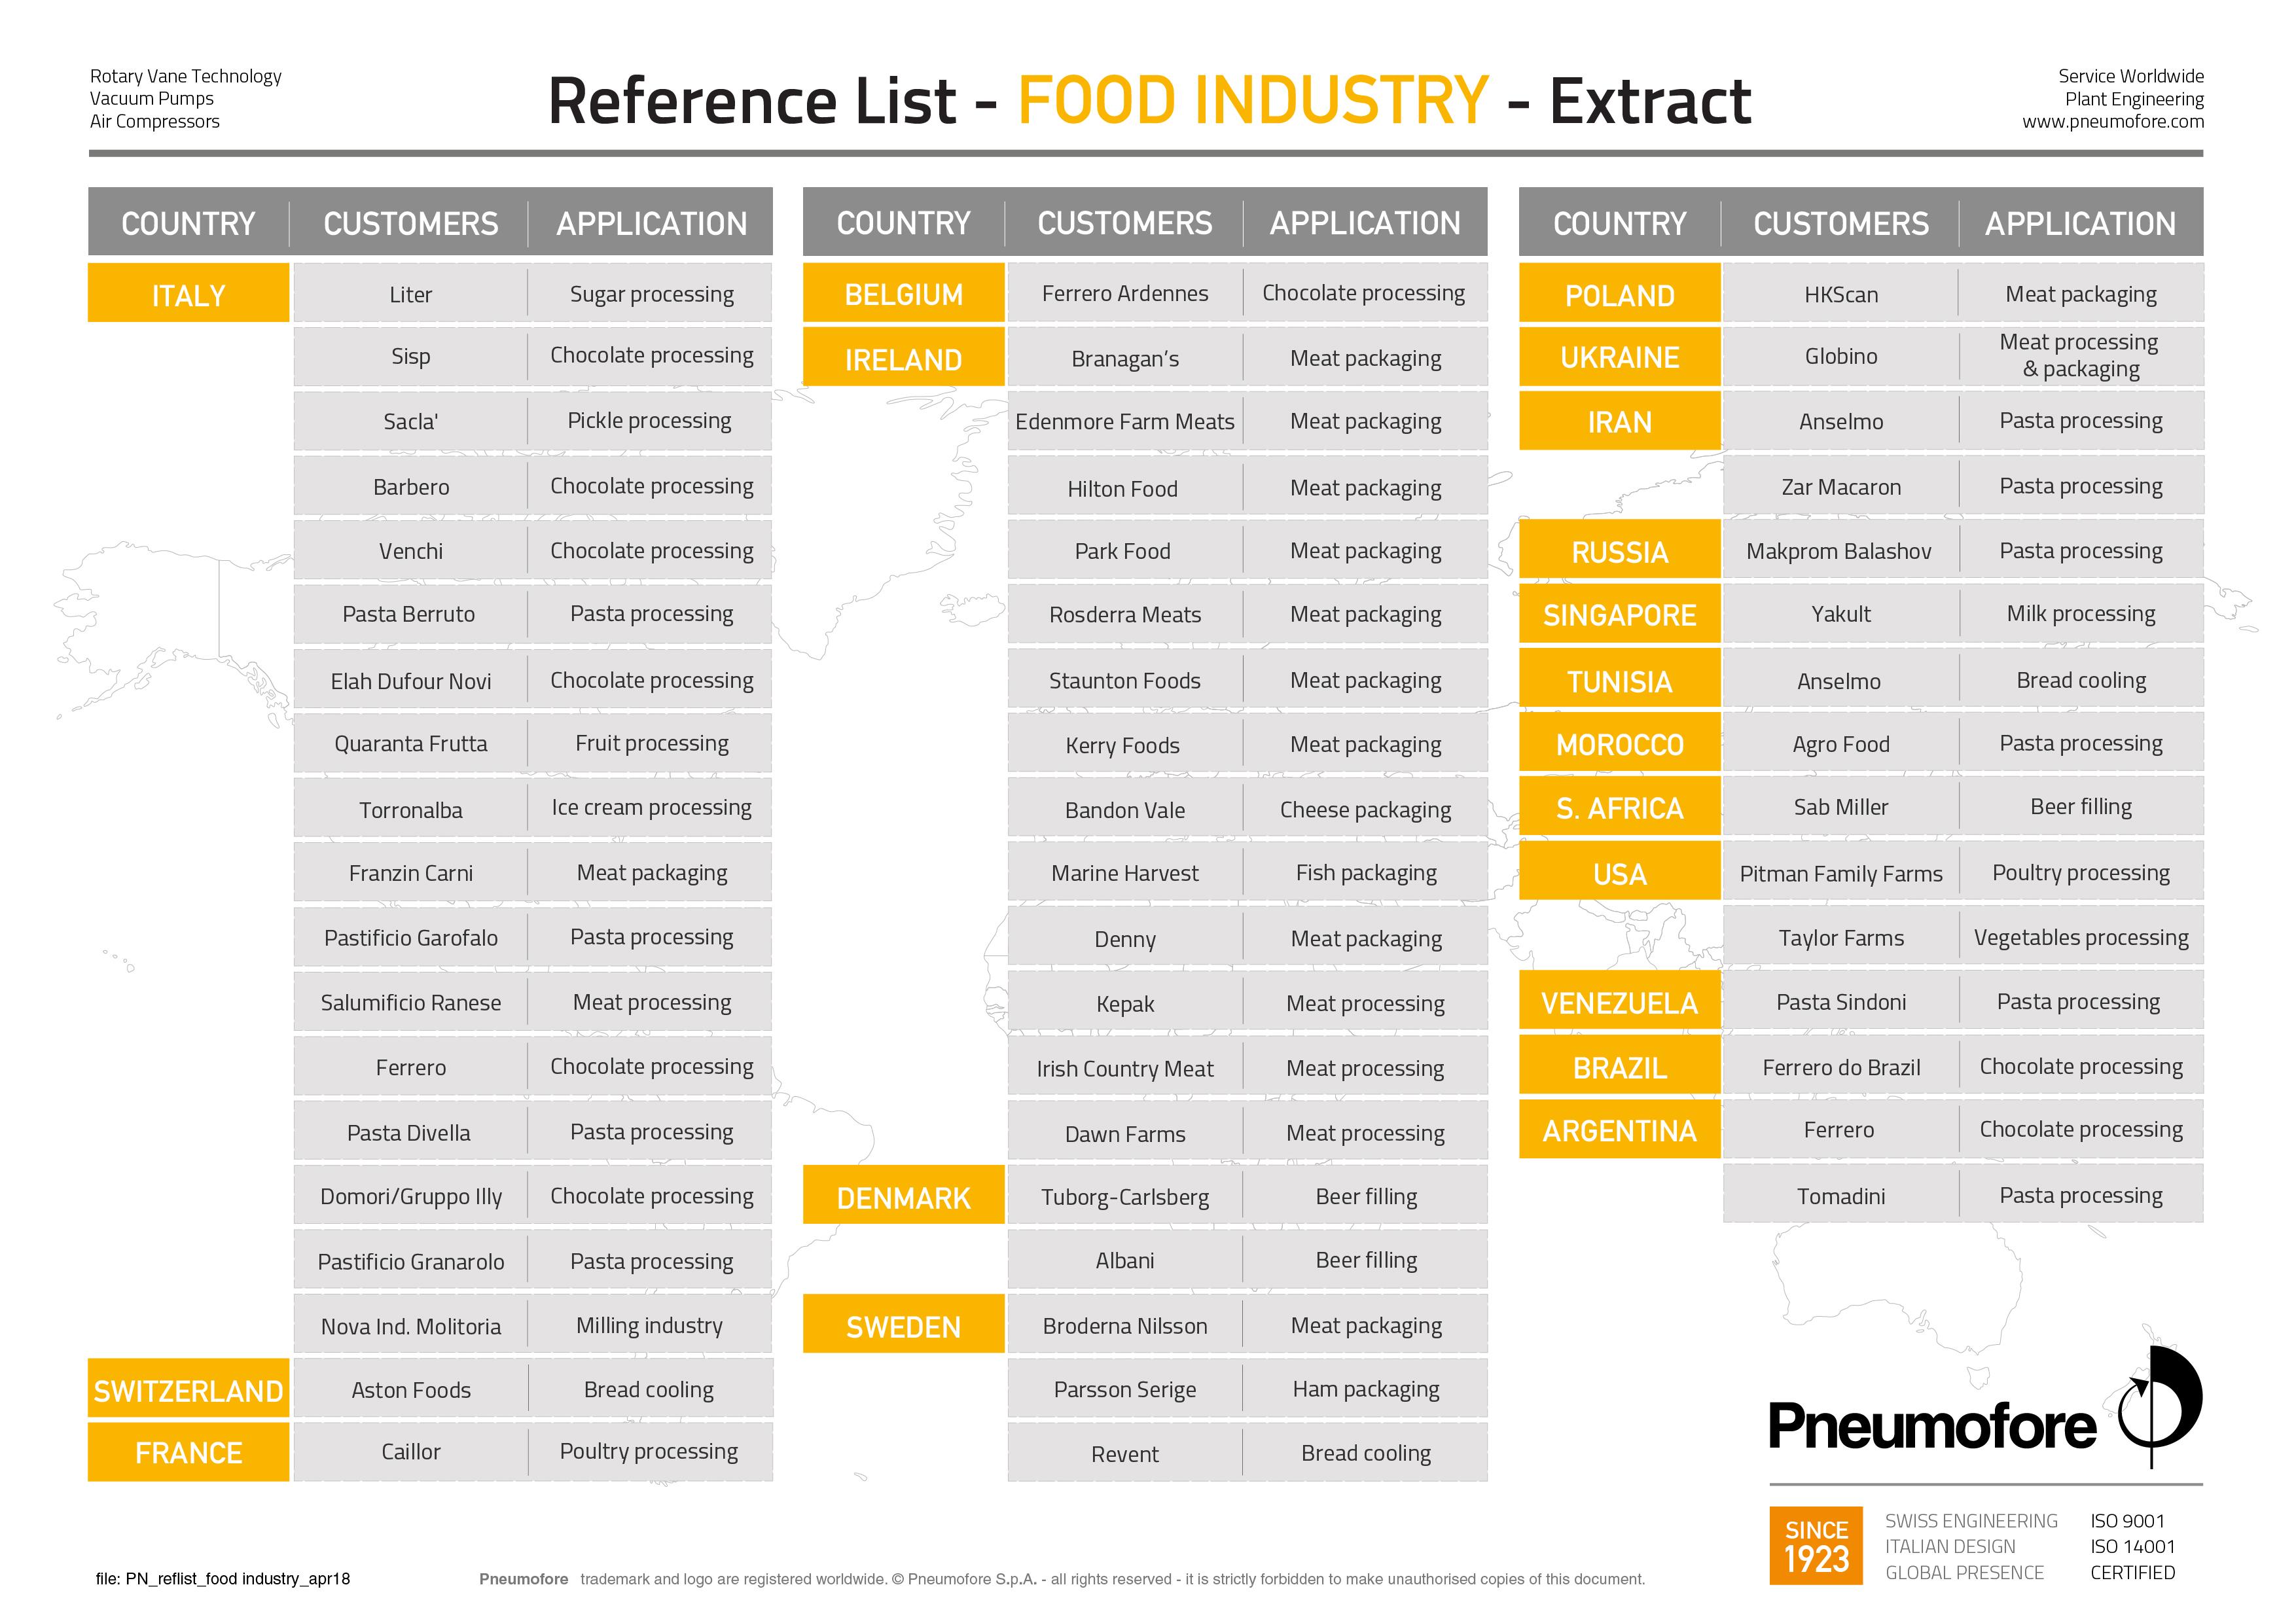 Pneumofore Worldwide Food - 2018